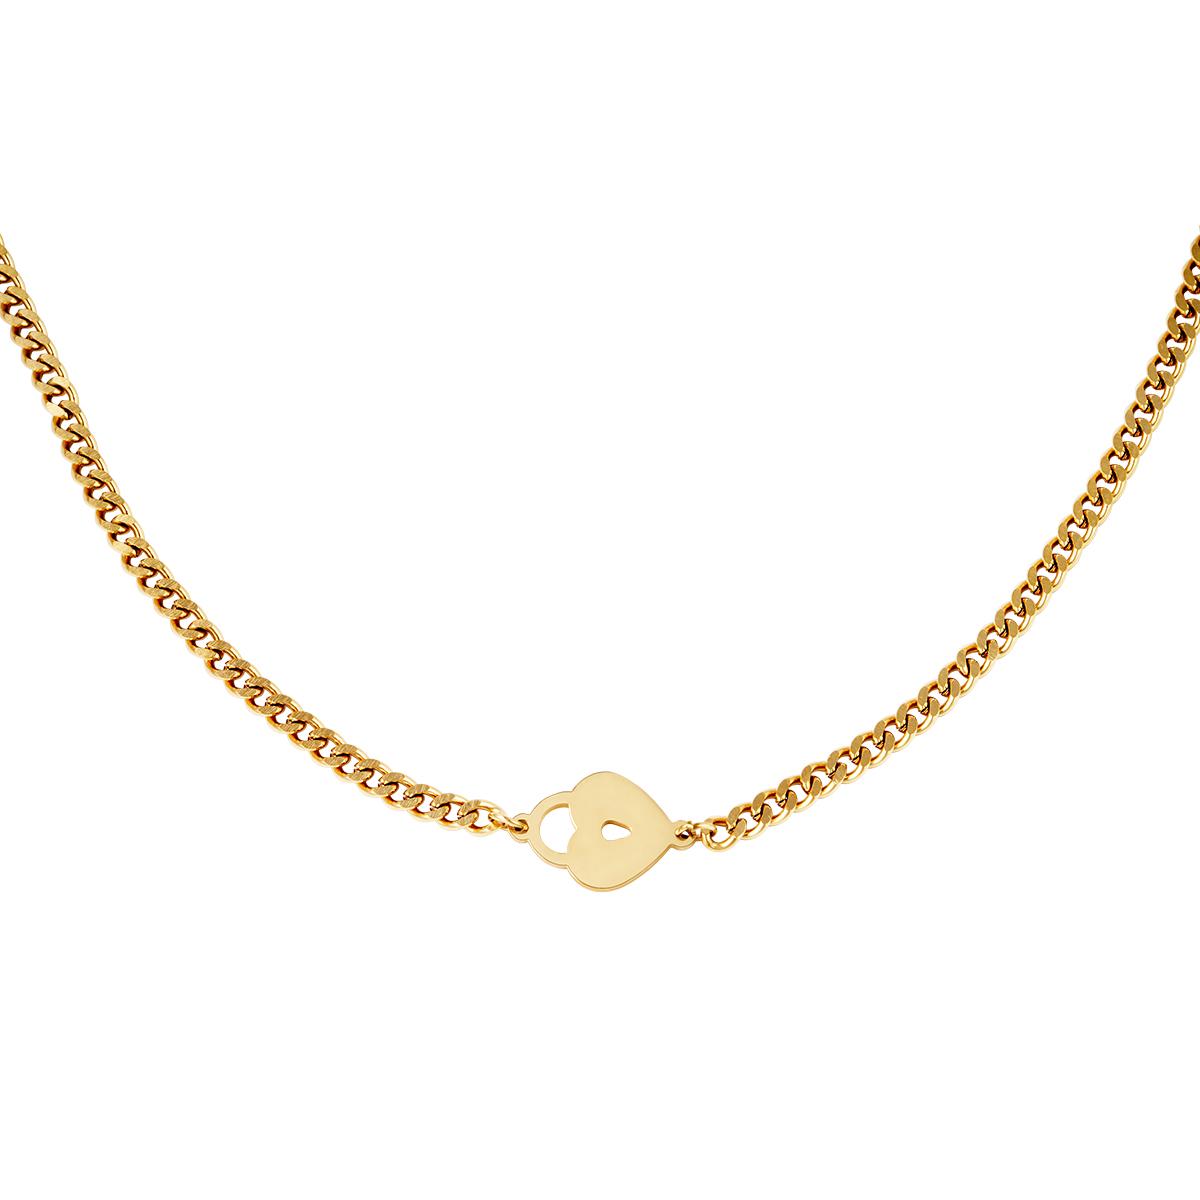 Halskette locked heart